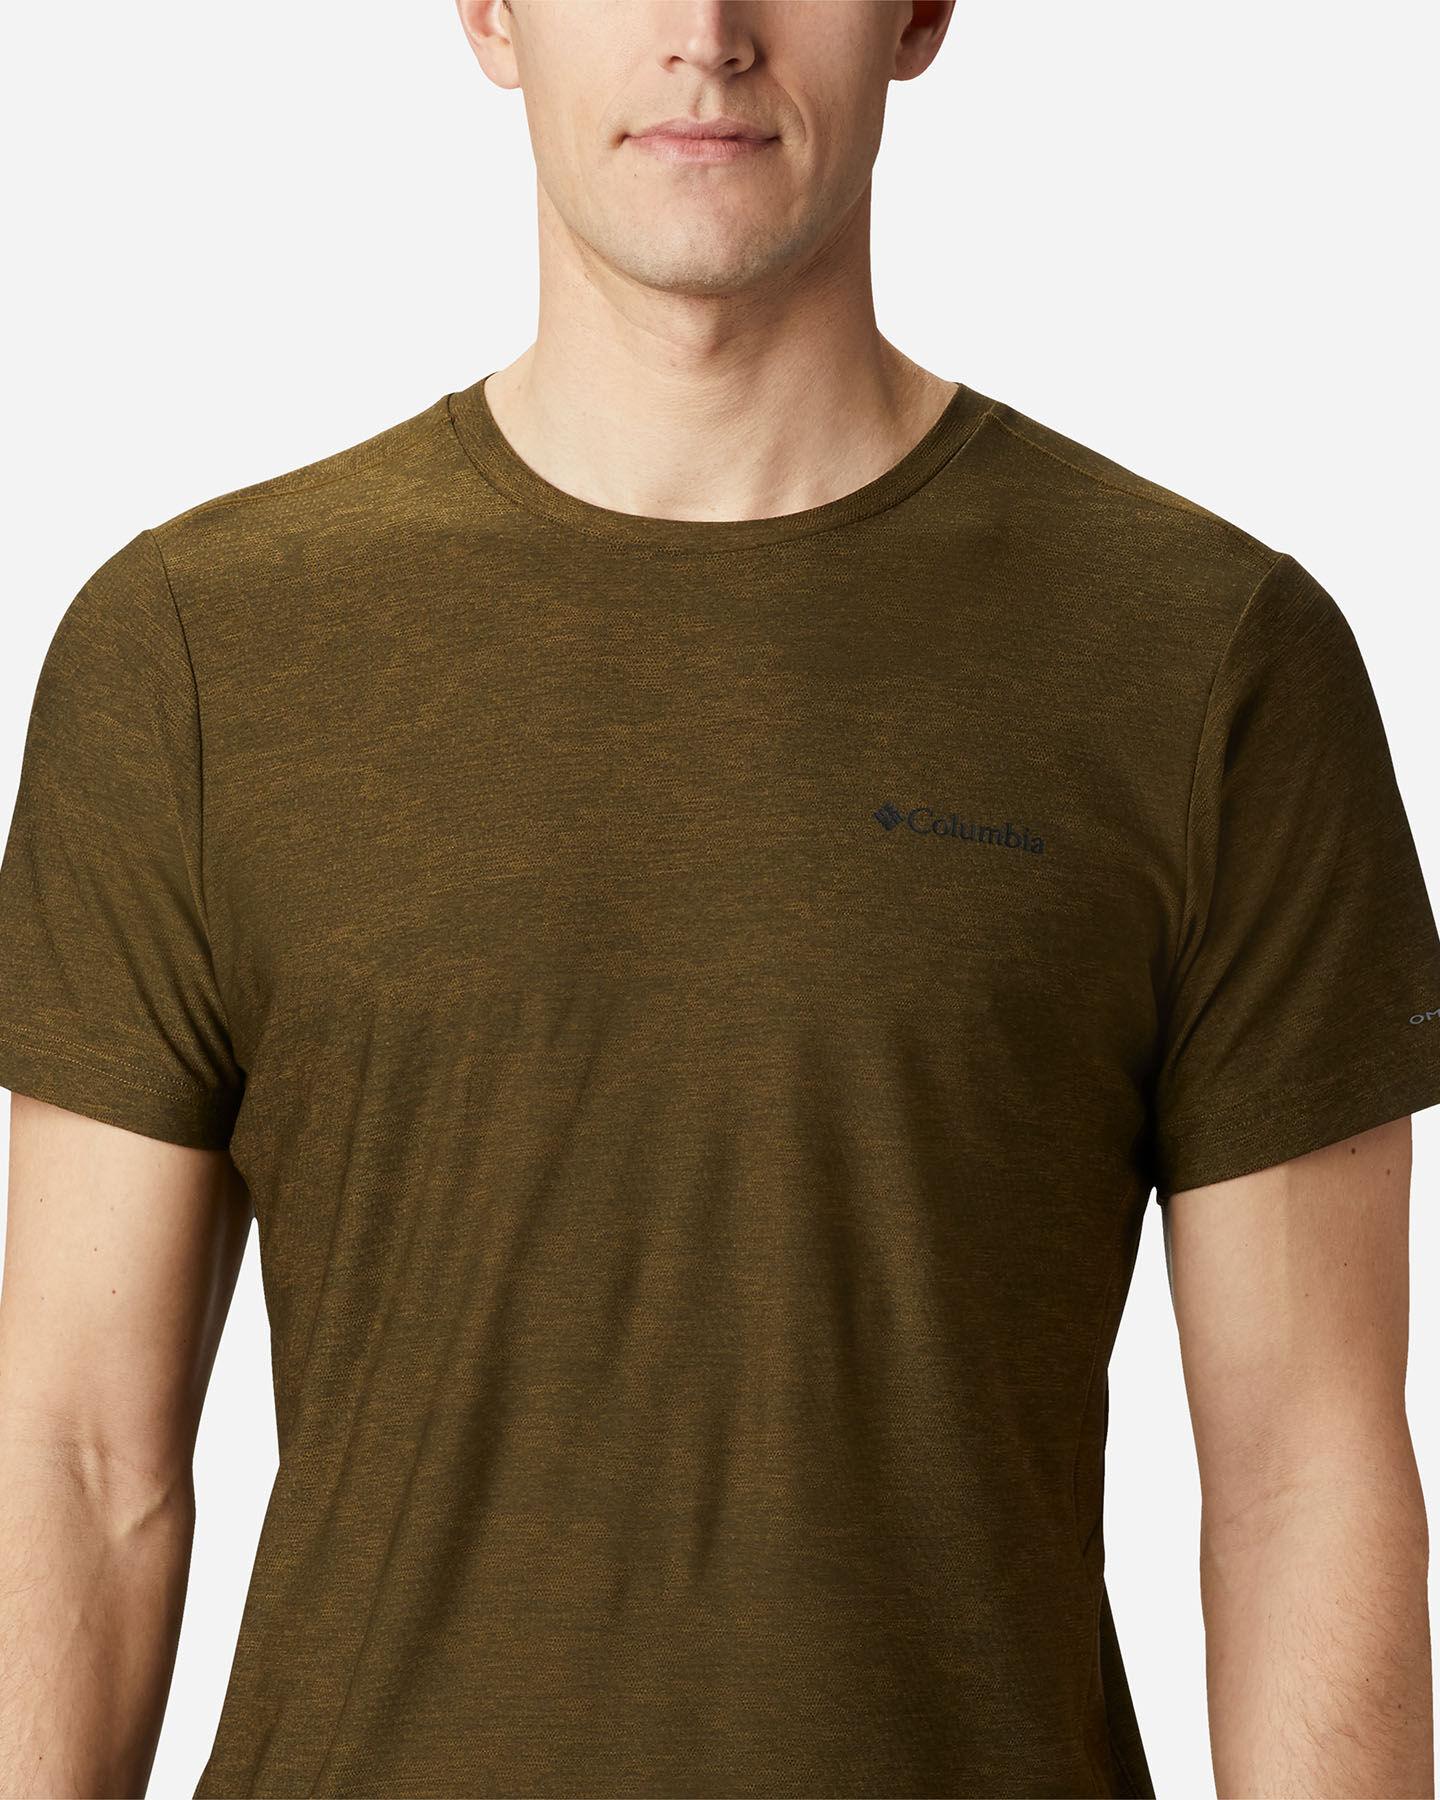 T-Shirt COLUMBIA MAXTRAIL LOGO M S5174874 scatto 4